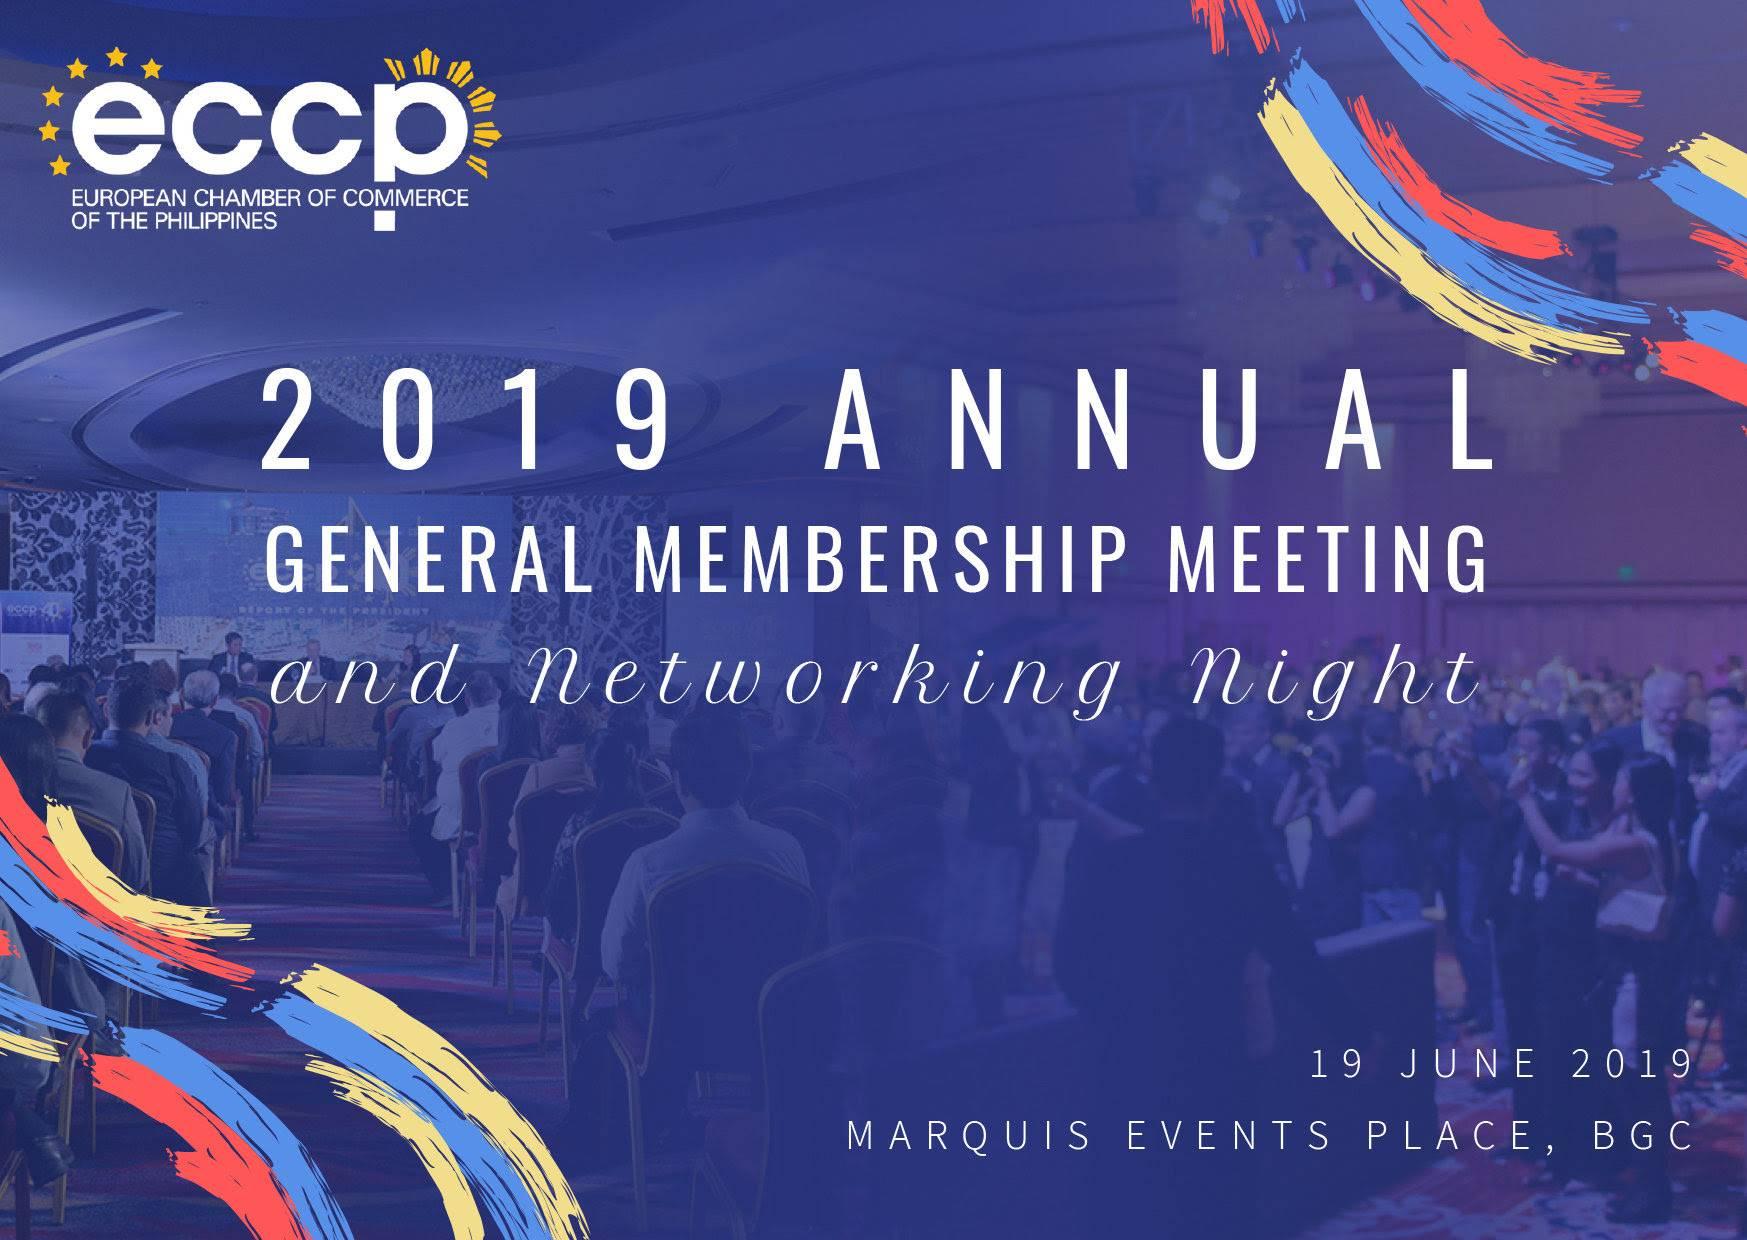 Annual General Membership Meeting 2019 & Networking Night